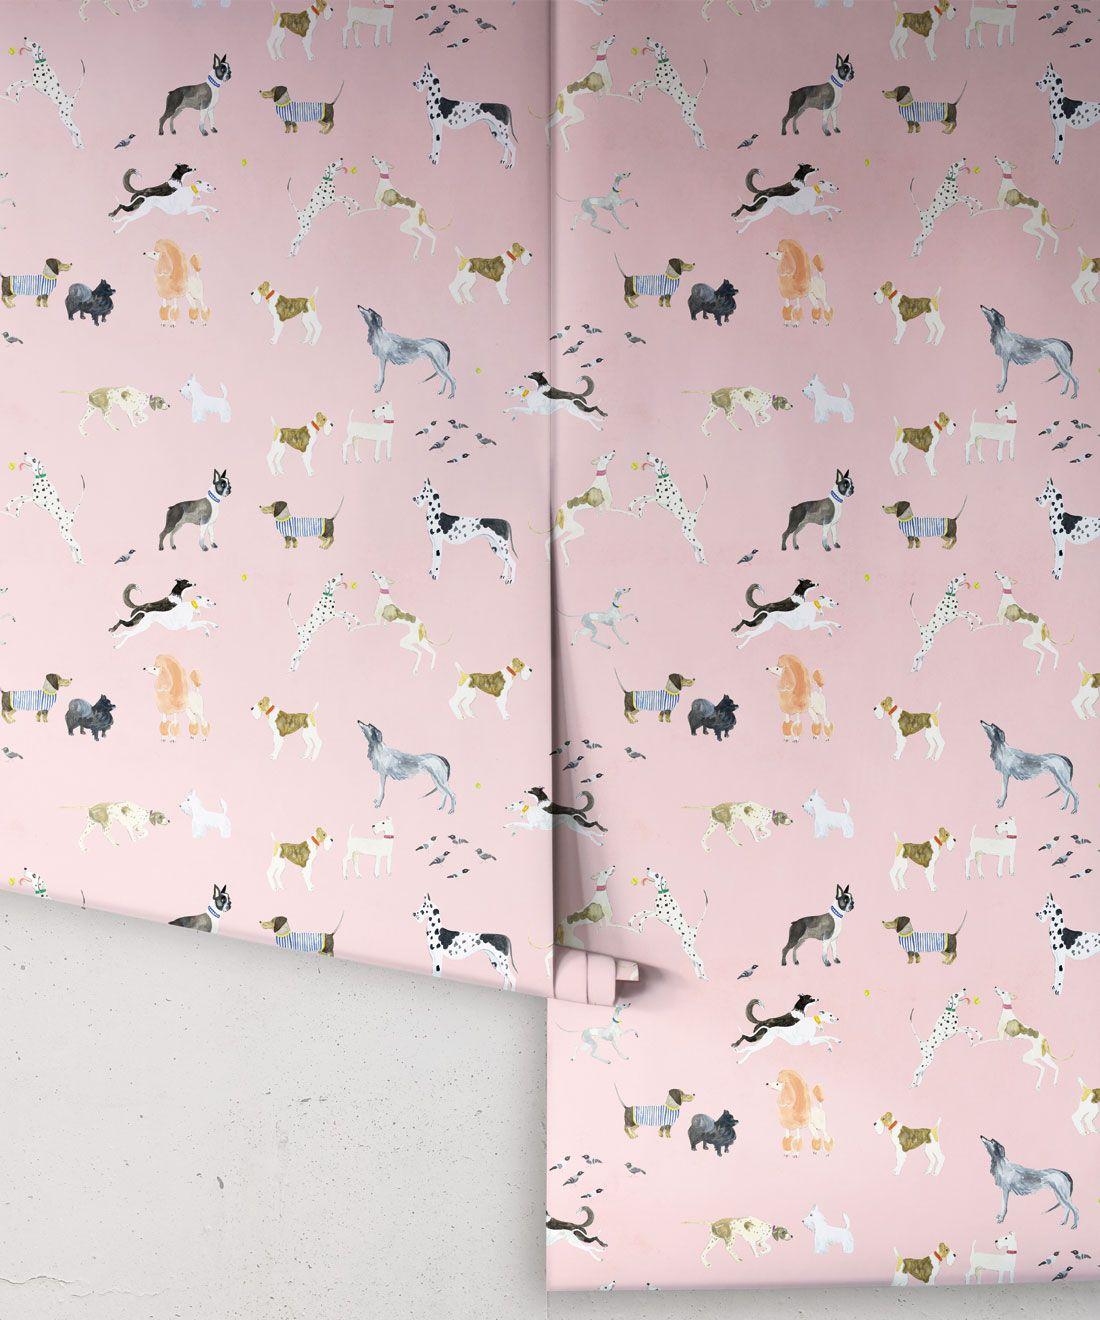 Doggies Wallpaper •Dog Wallpaper •Pink • Rolls